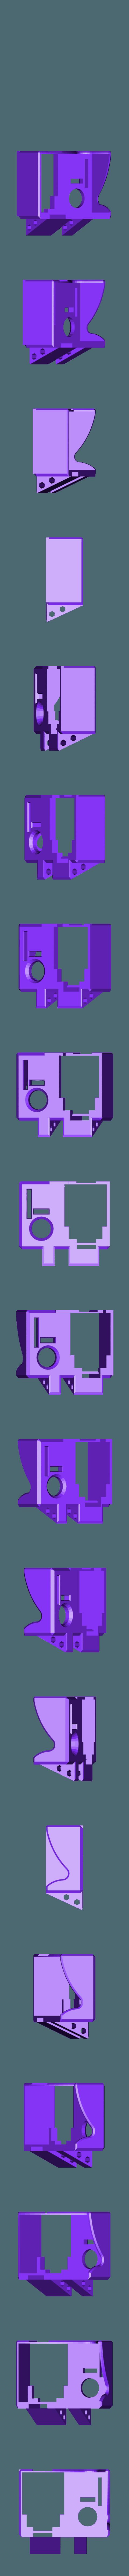 GoPro_LayerLens.stl Download free STL file ZMR GoPro Layerlens Case mount • 3D print template, LydiaPy